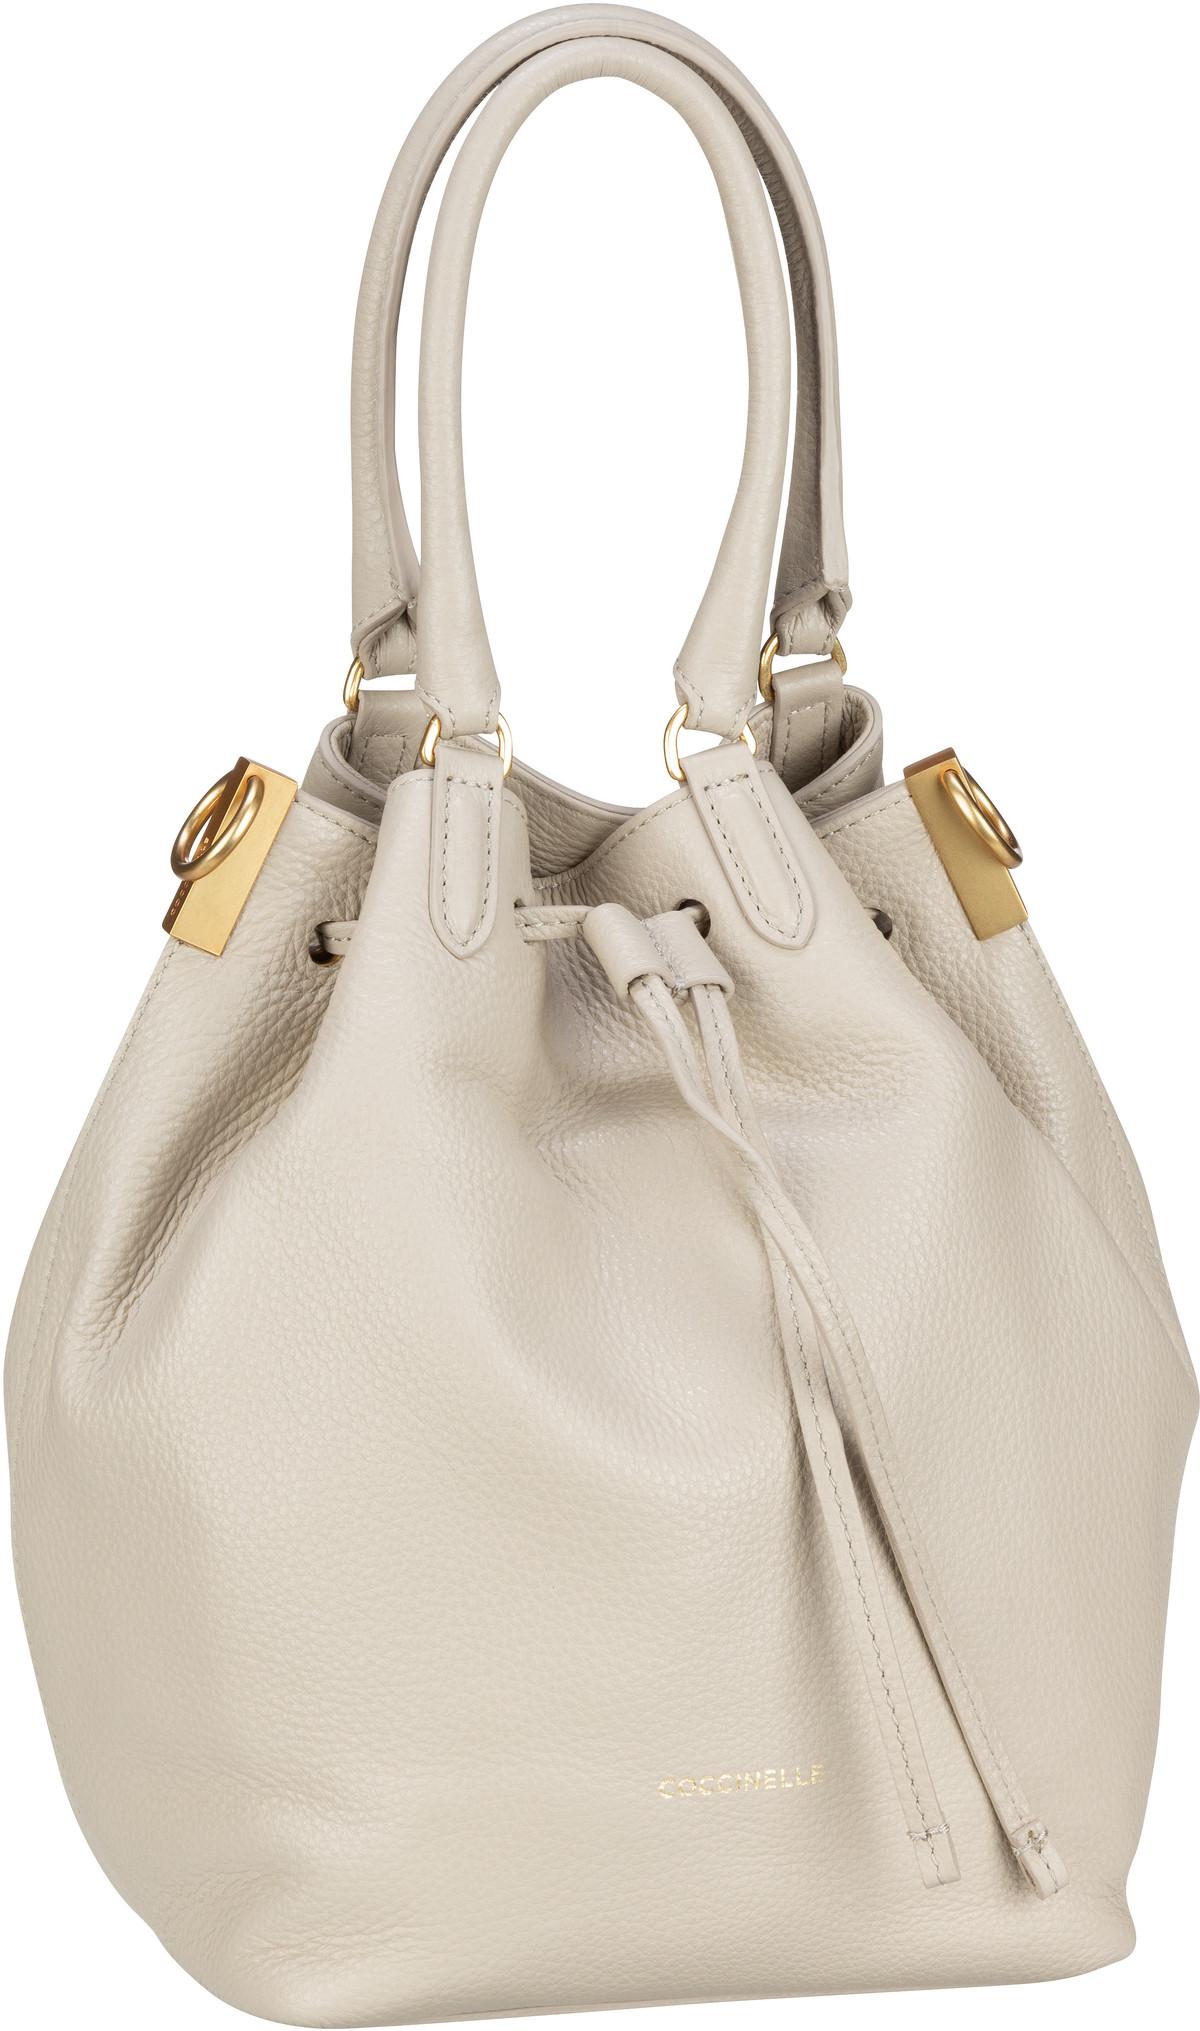 Handtasche Gabrielle 1802 Seashell